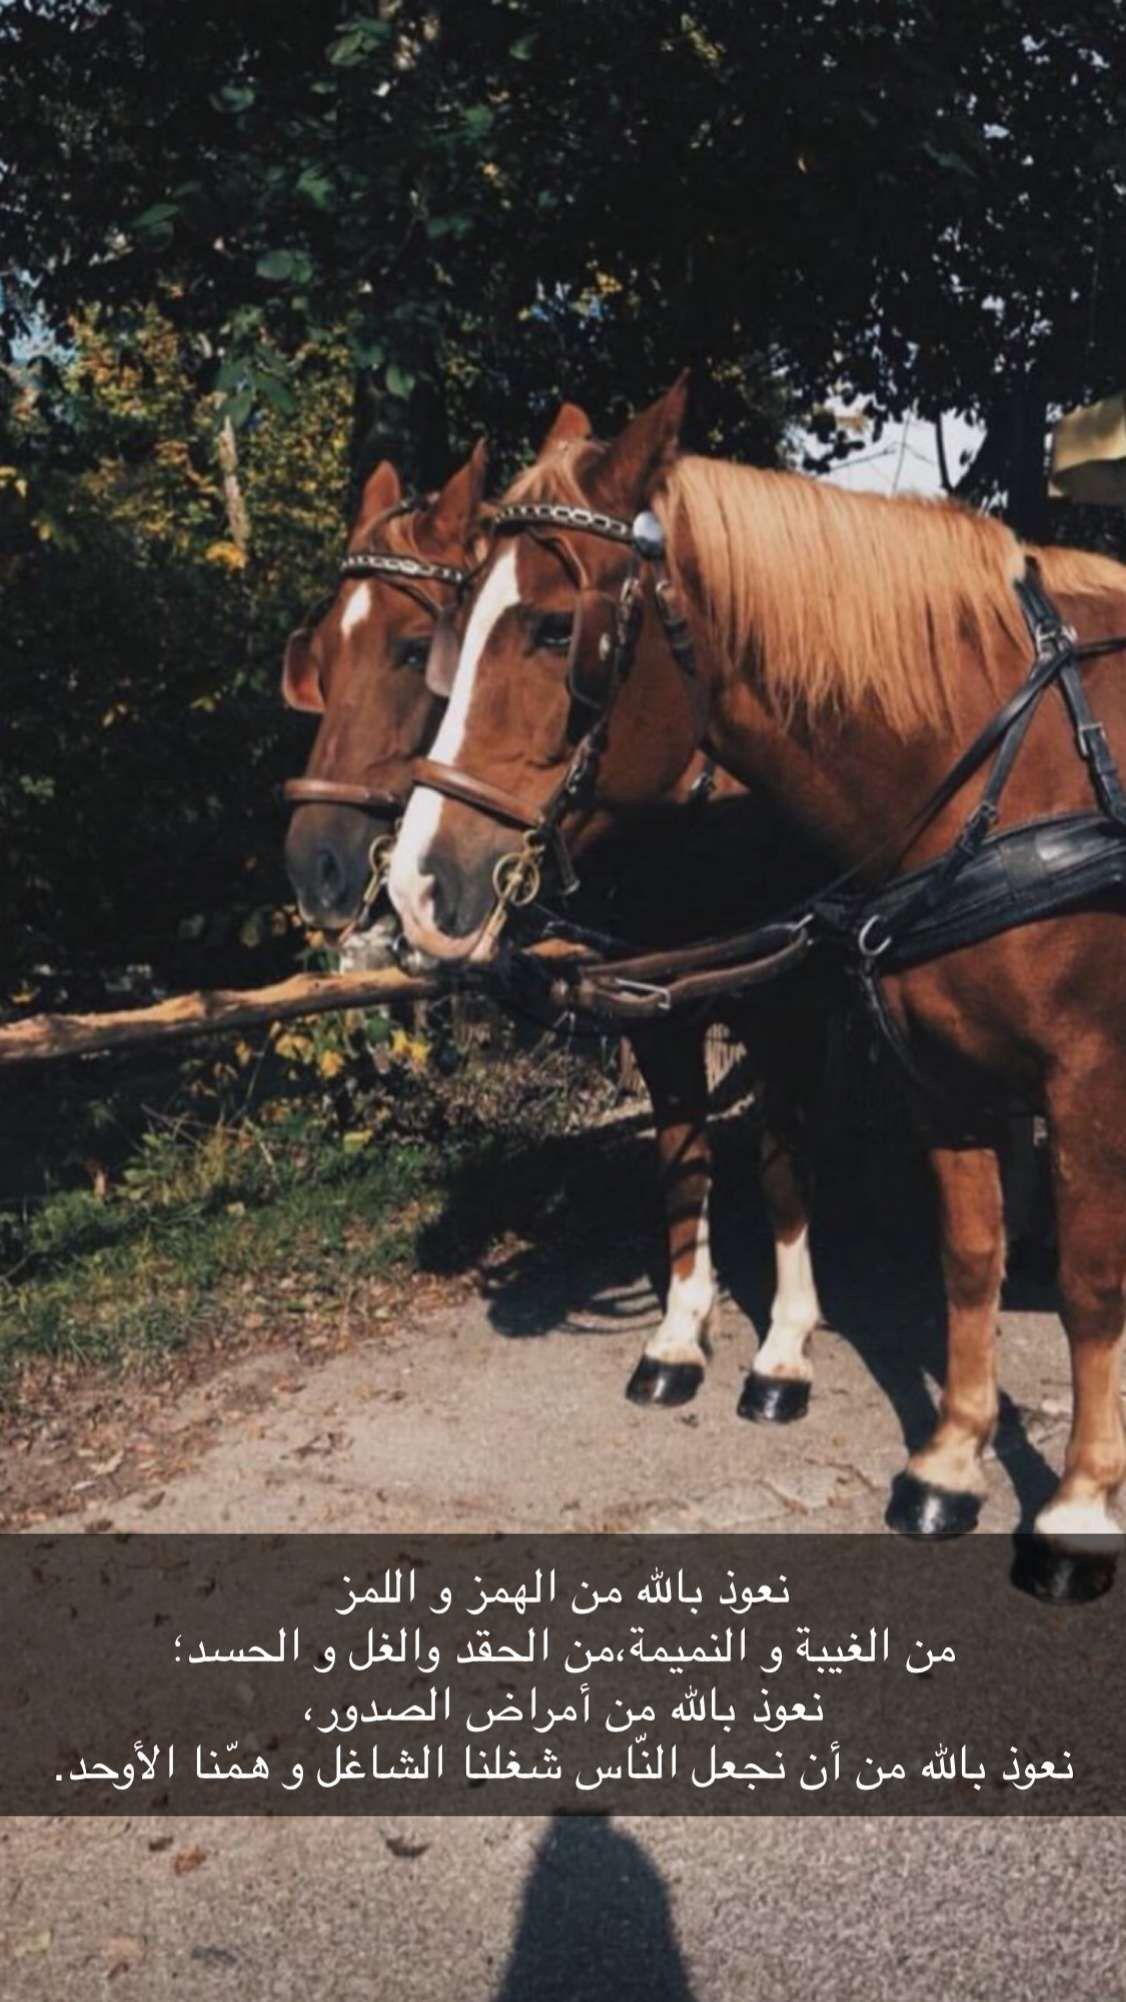 Pin By الوتين On خلفيات دينية Horses Animals